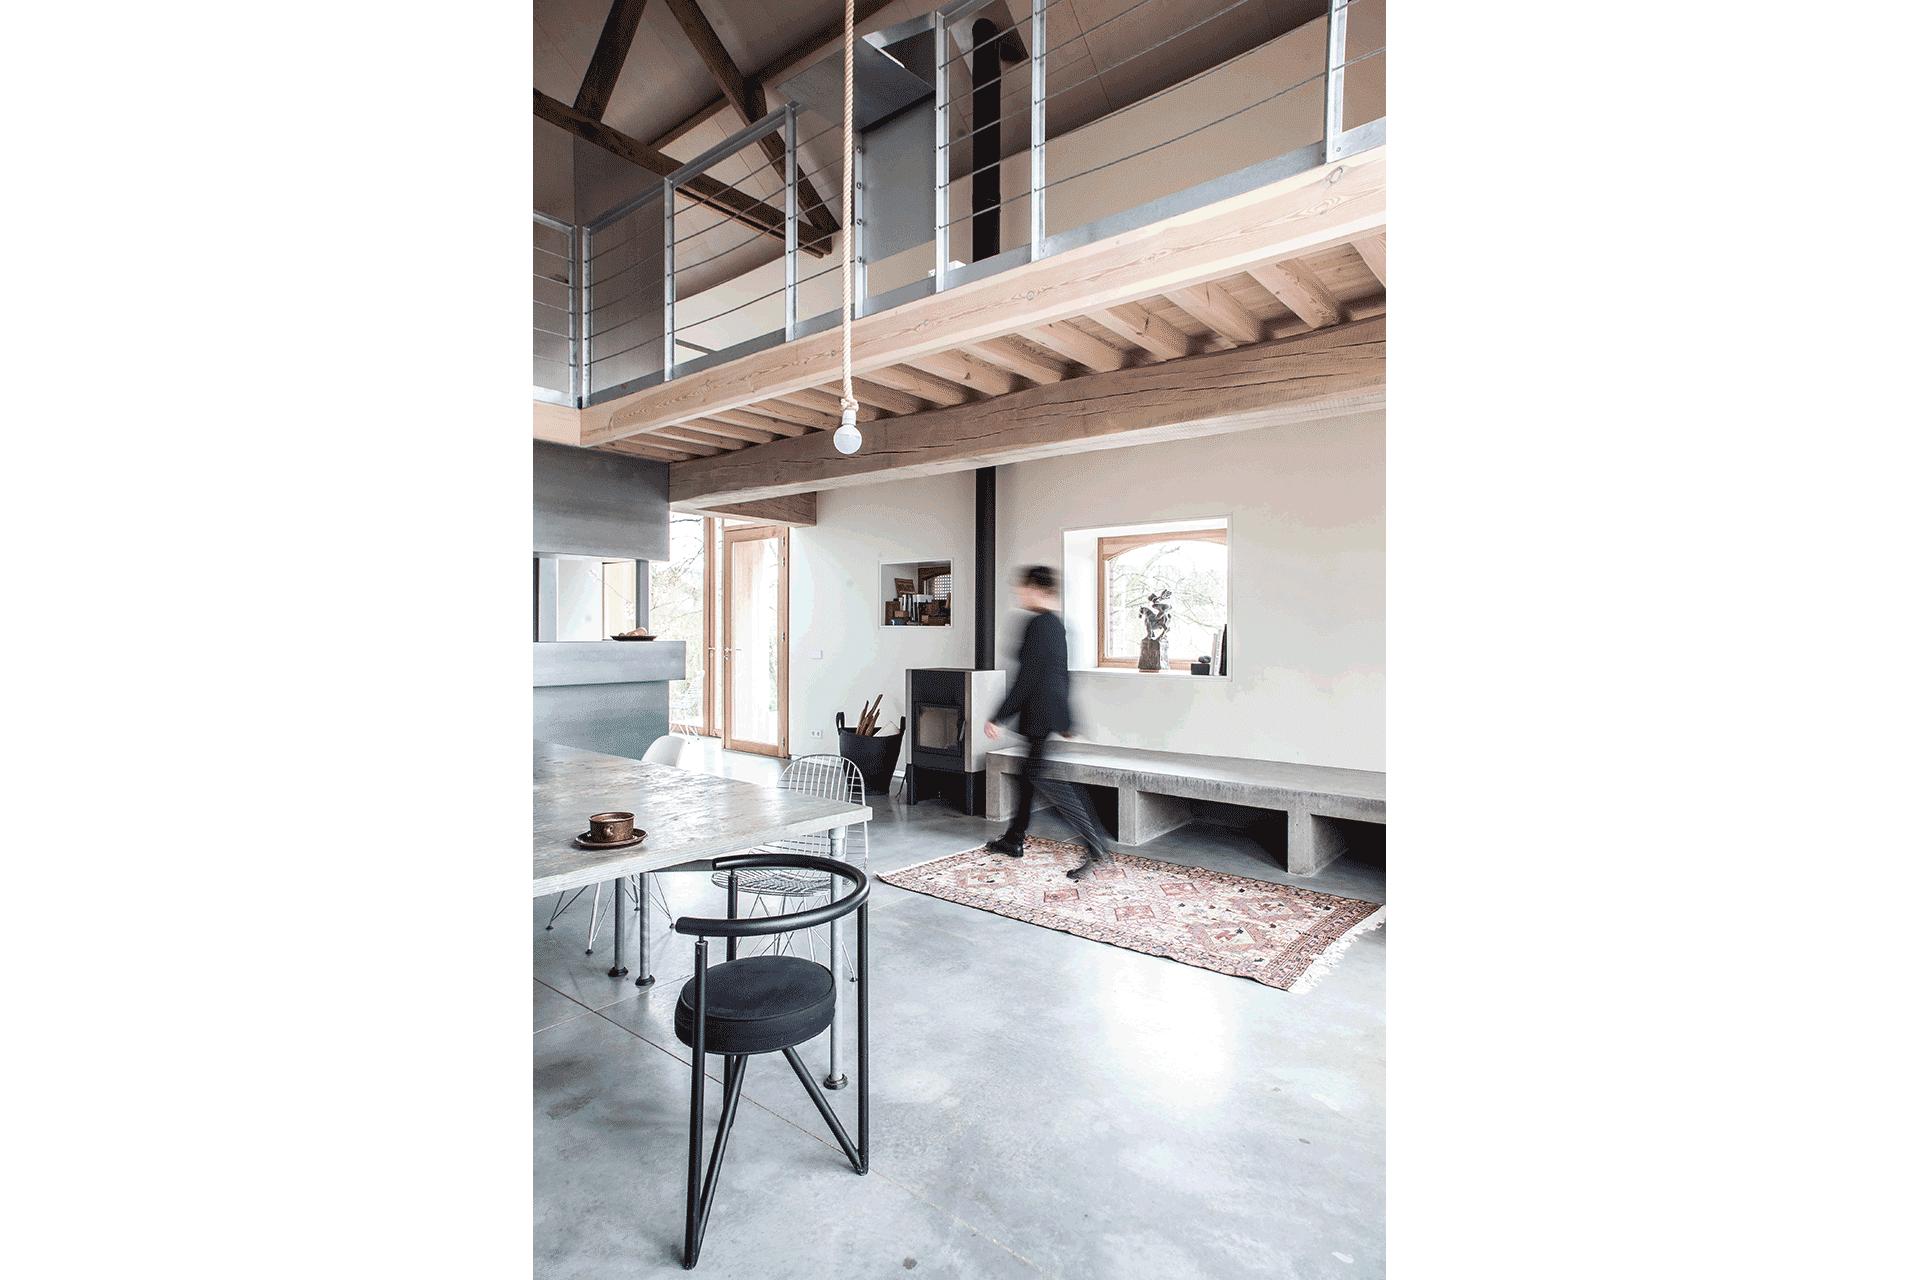 Interieur boerderij verbouwen huis zuid limburg licht hout beton staal industrieel